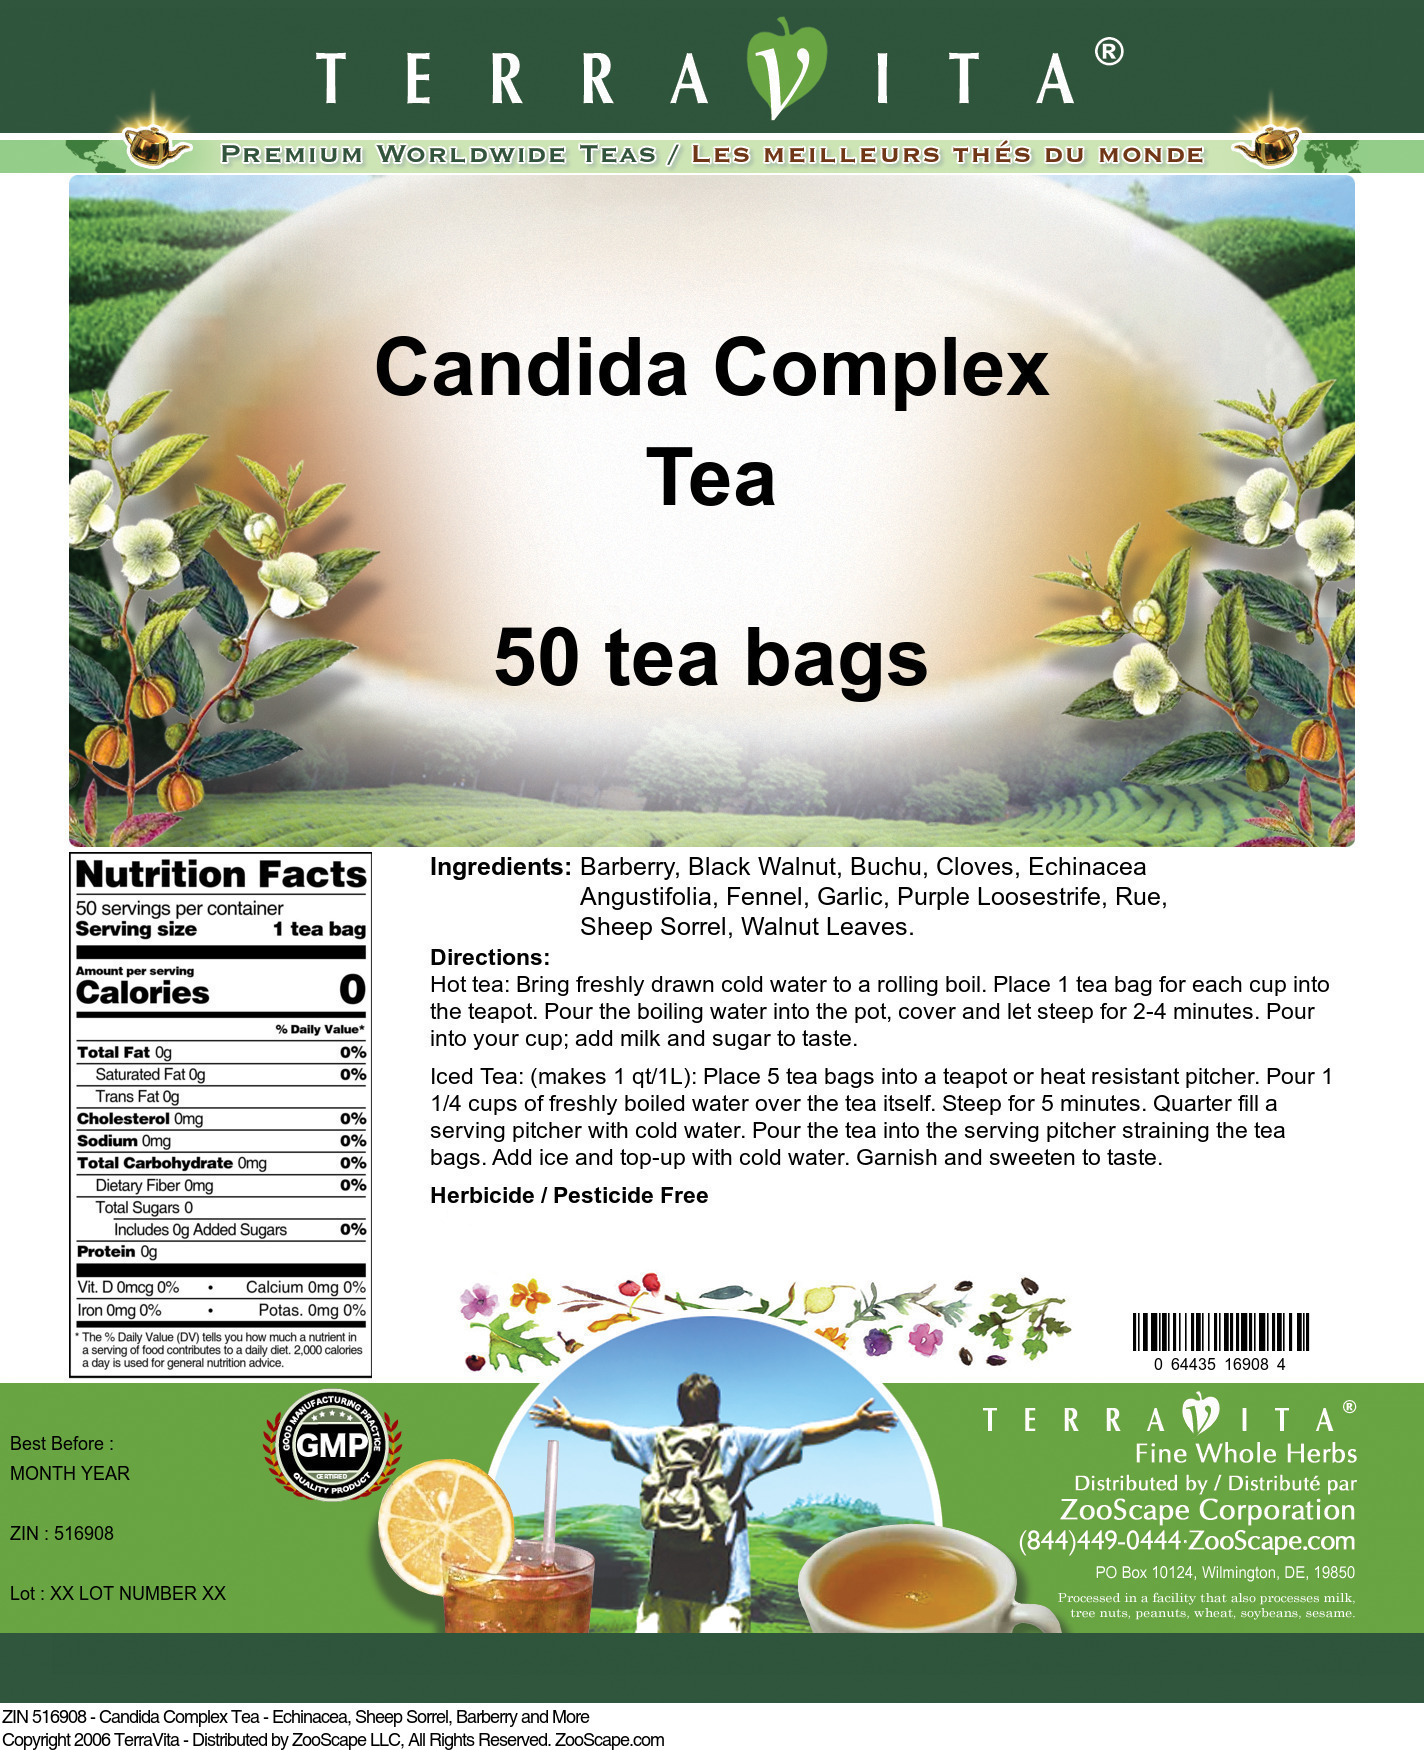 Candida Complex Tea - Echinacea, Sheep Sorrel, Barberry and More